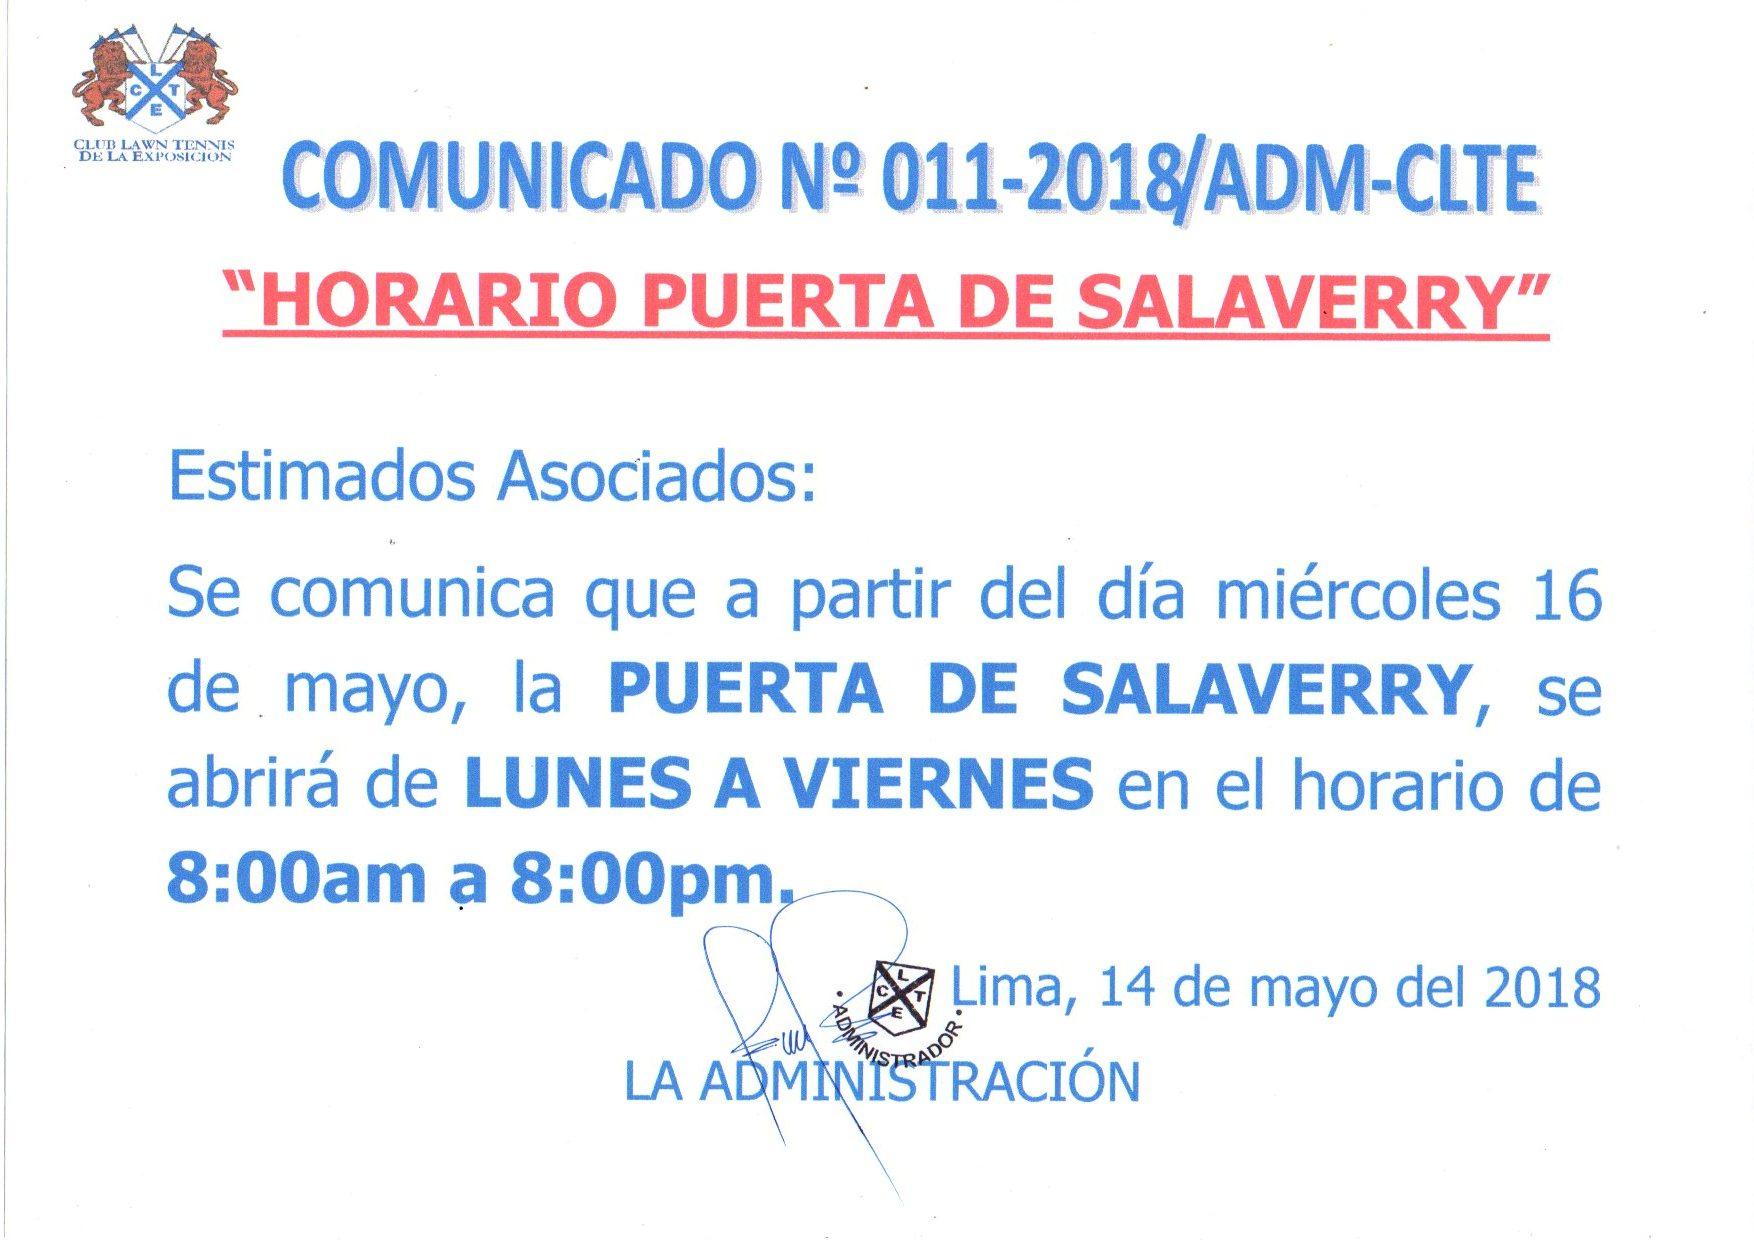 Comunicado N°011-2018ADM CLTE - Horario Puerta Av. Salaverry